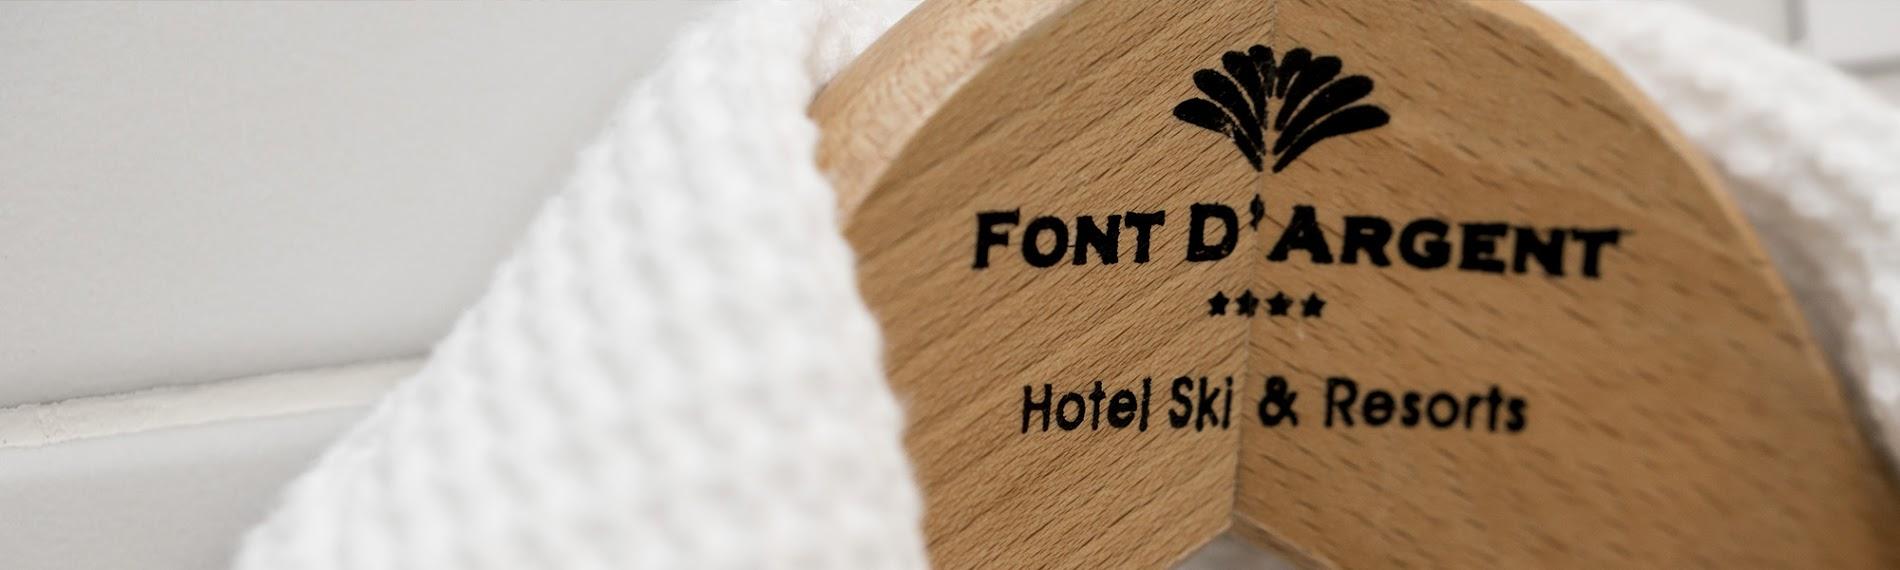 Réservation d'hôtel en Andorre